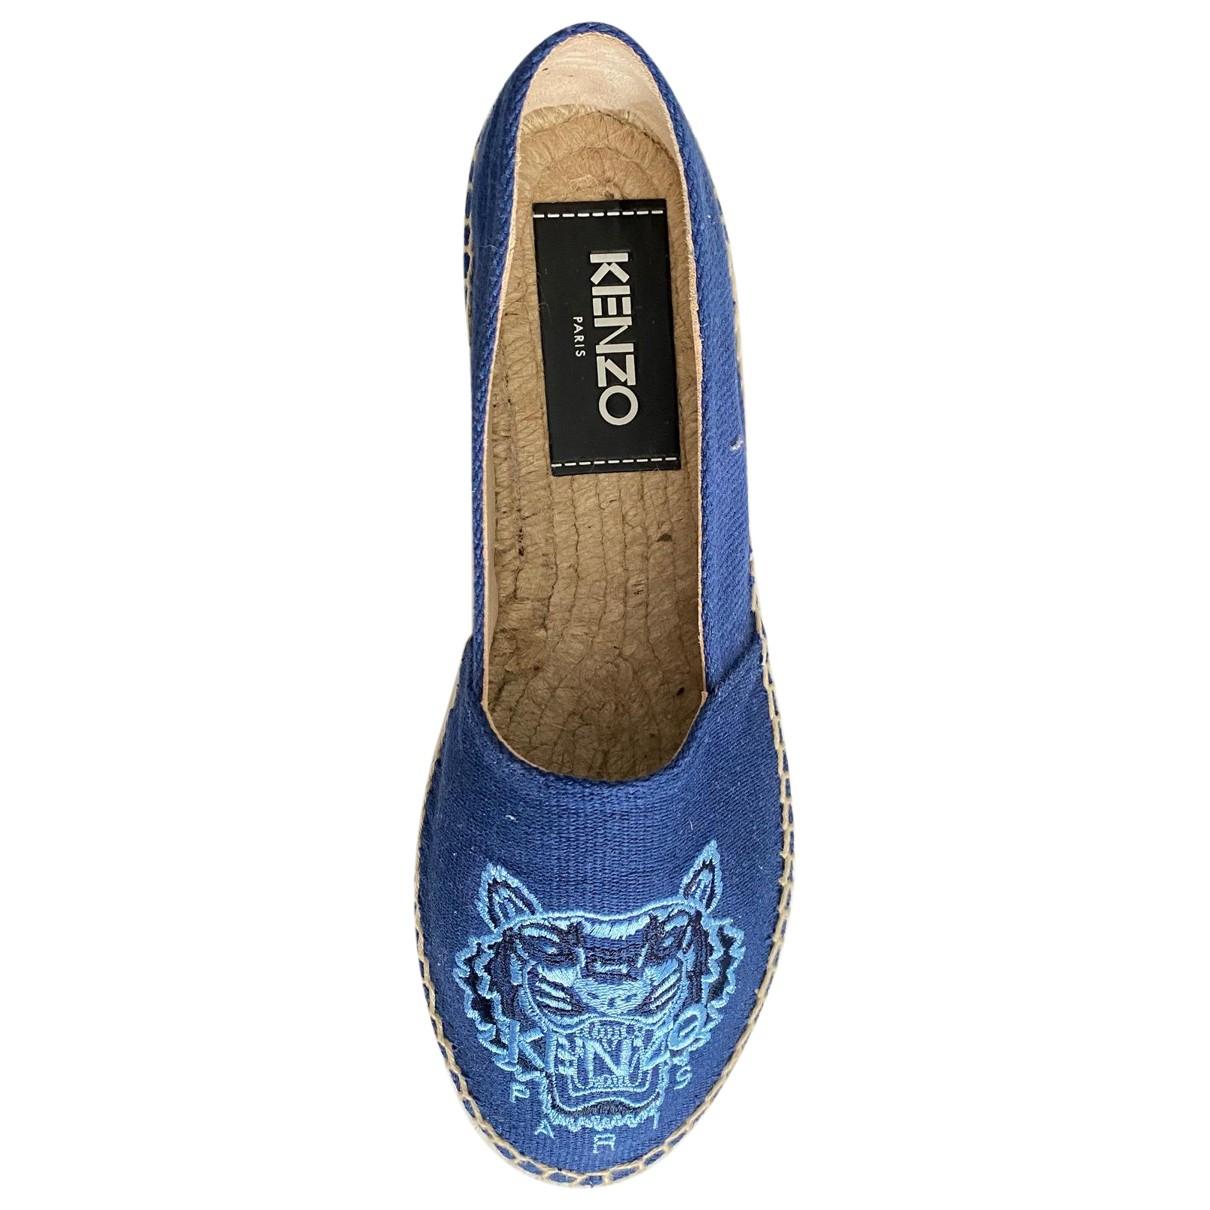 Kenzo \N Espadrilles in  Blau Leinen